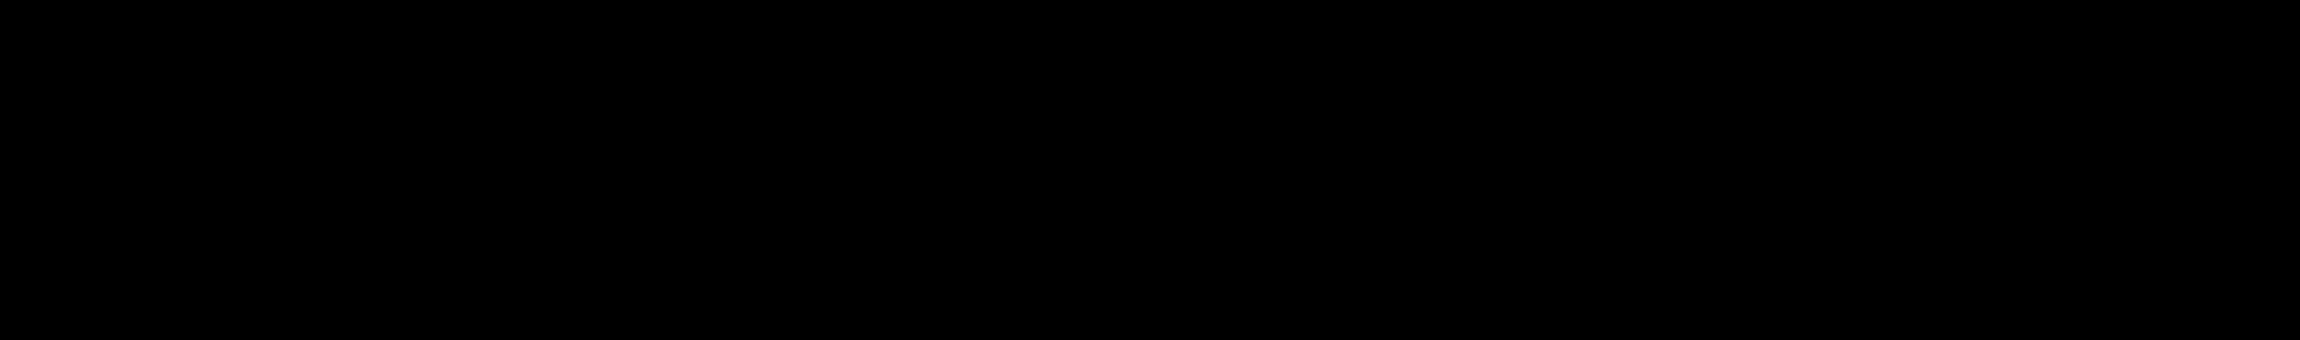 Taloflow logo